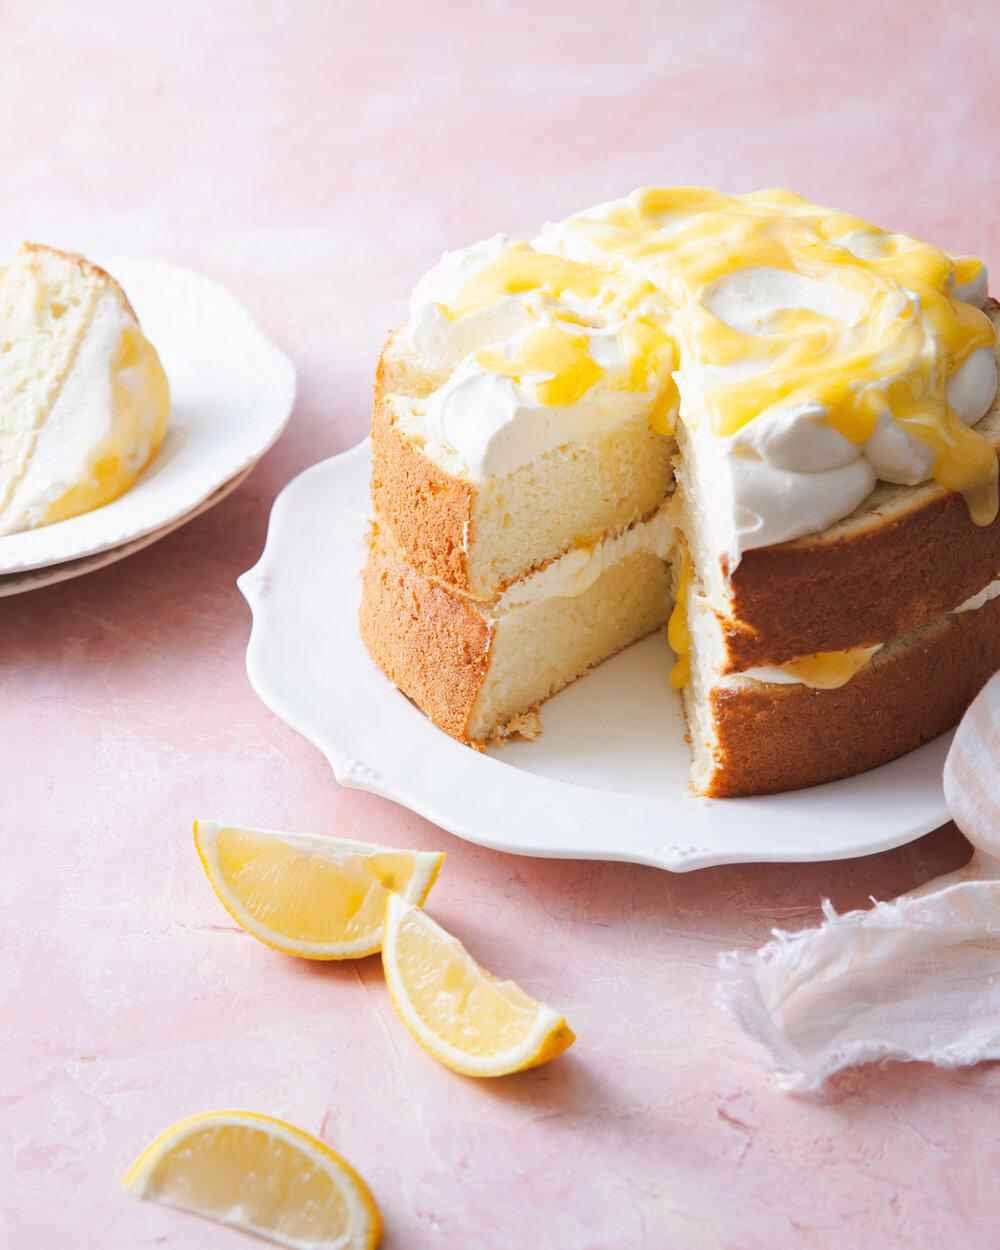 Lemon Chiffon Layer Cake with lemon curd and mascarpone cream